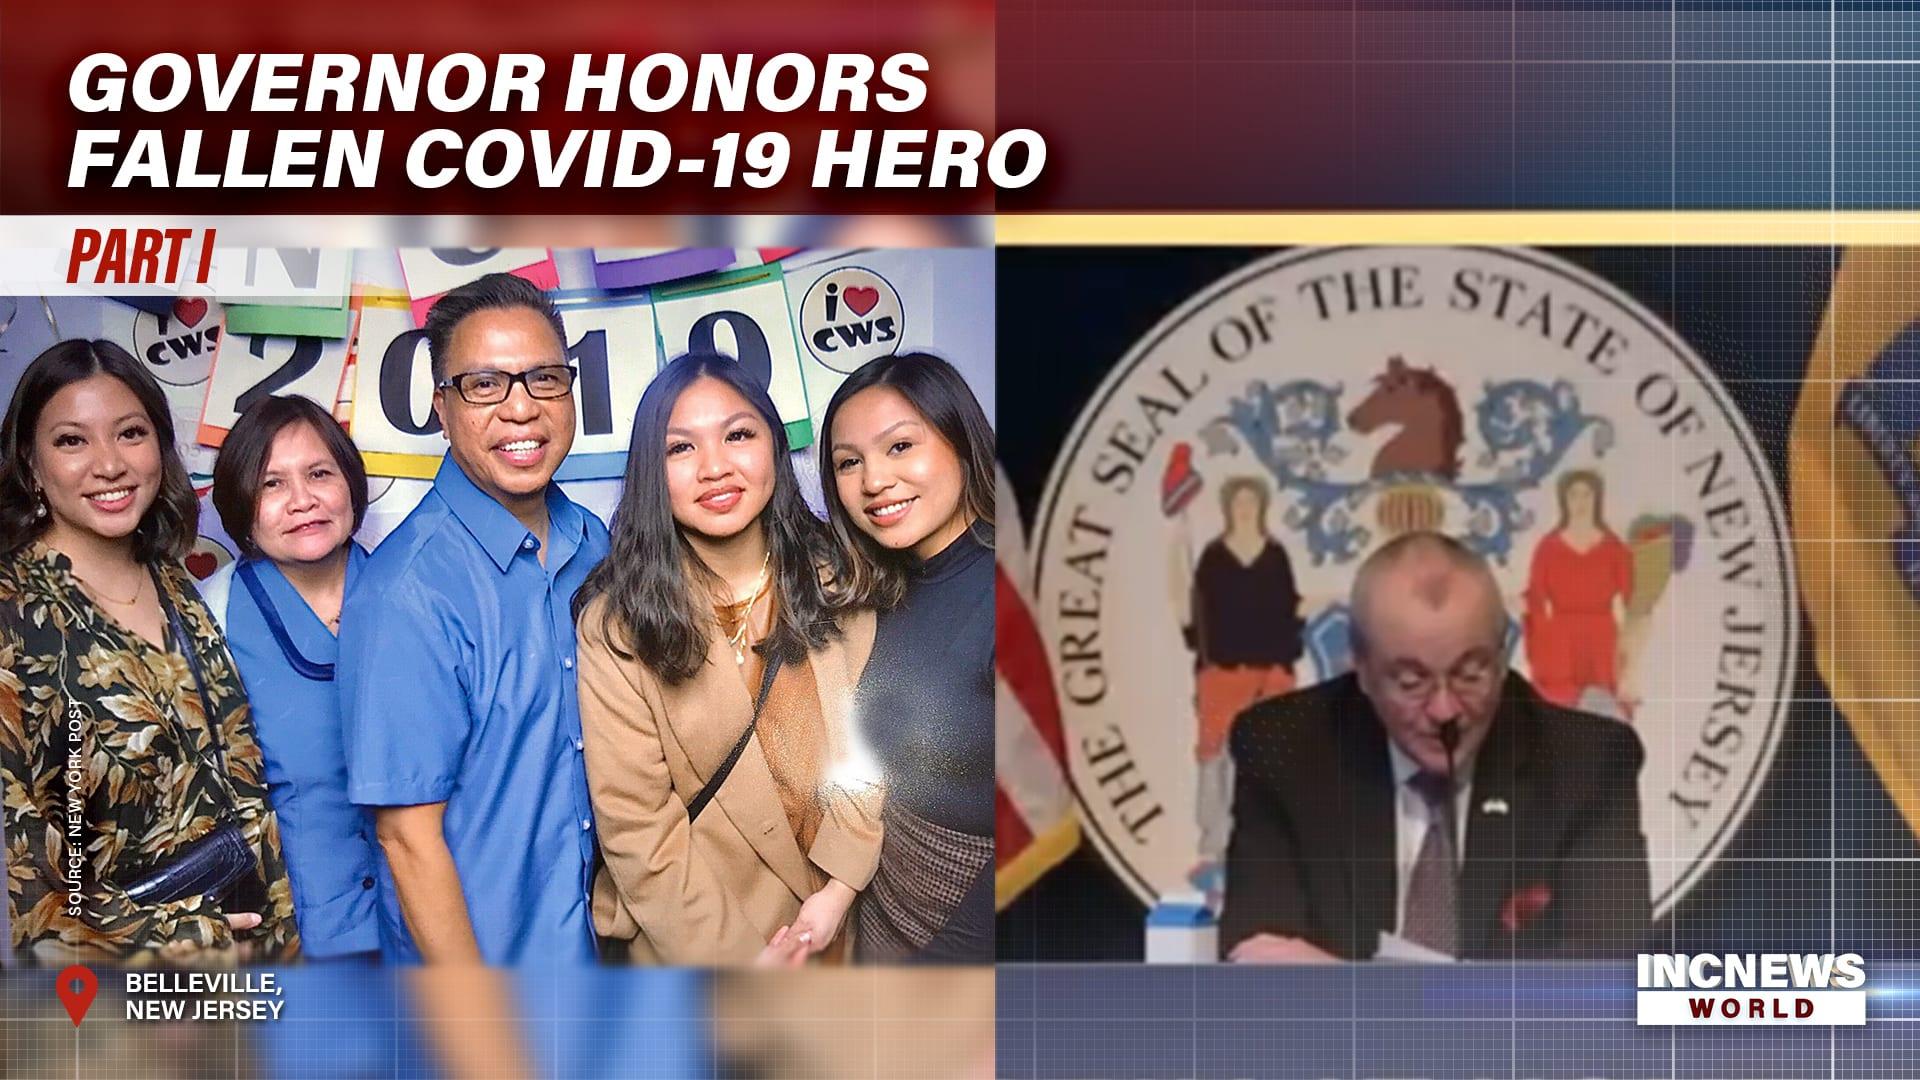 Governor Honors Fallen COVID-19 Hero